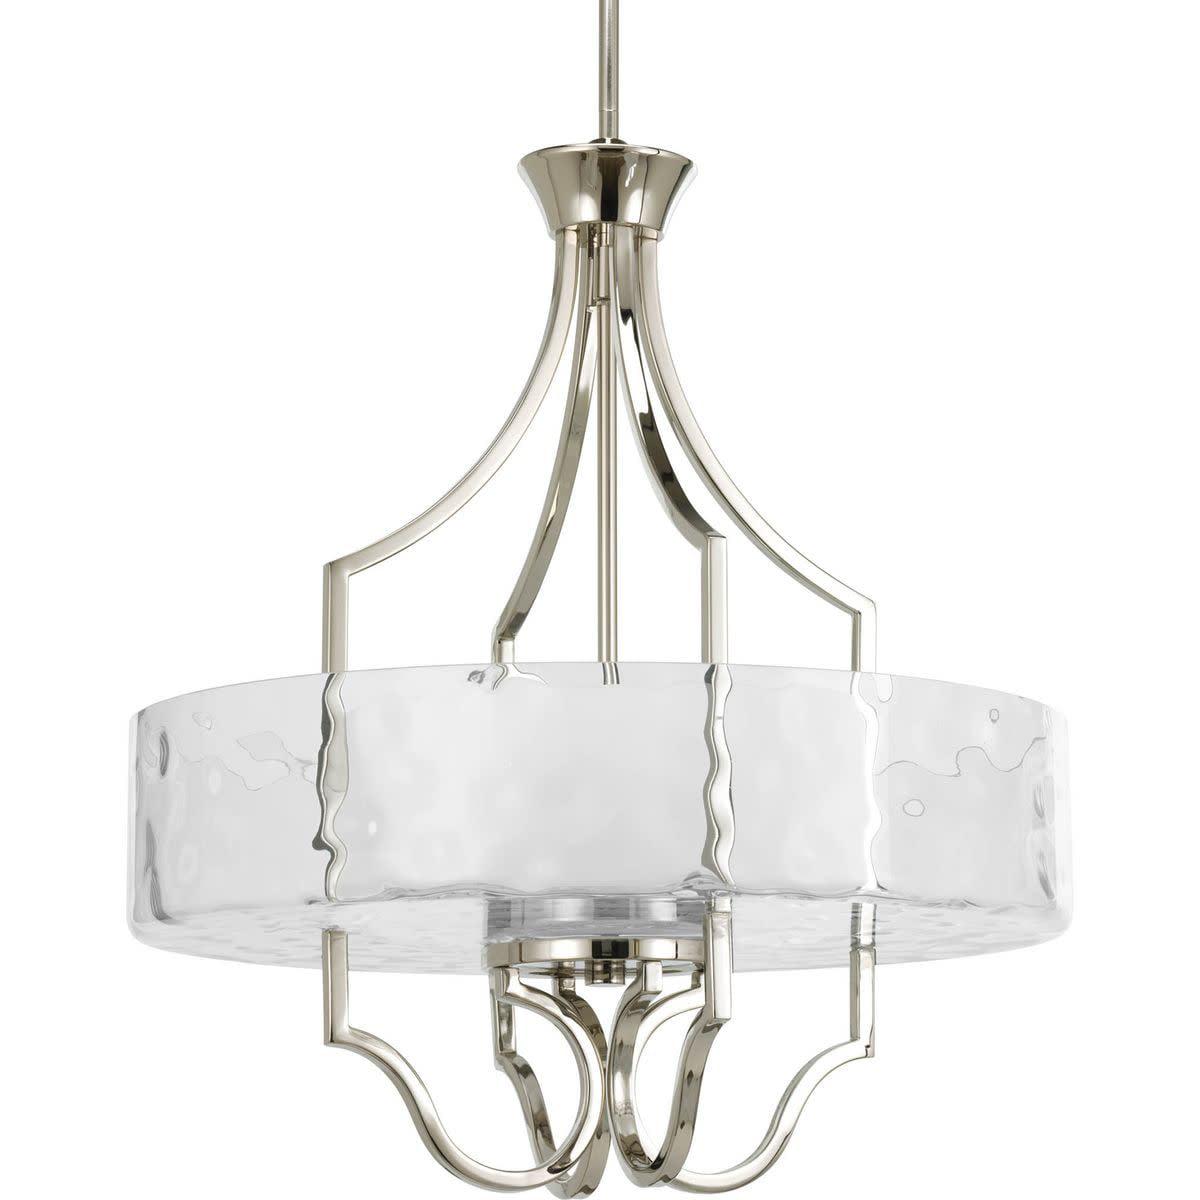 Caress Three-Light Inverted Pendant